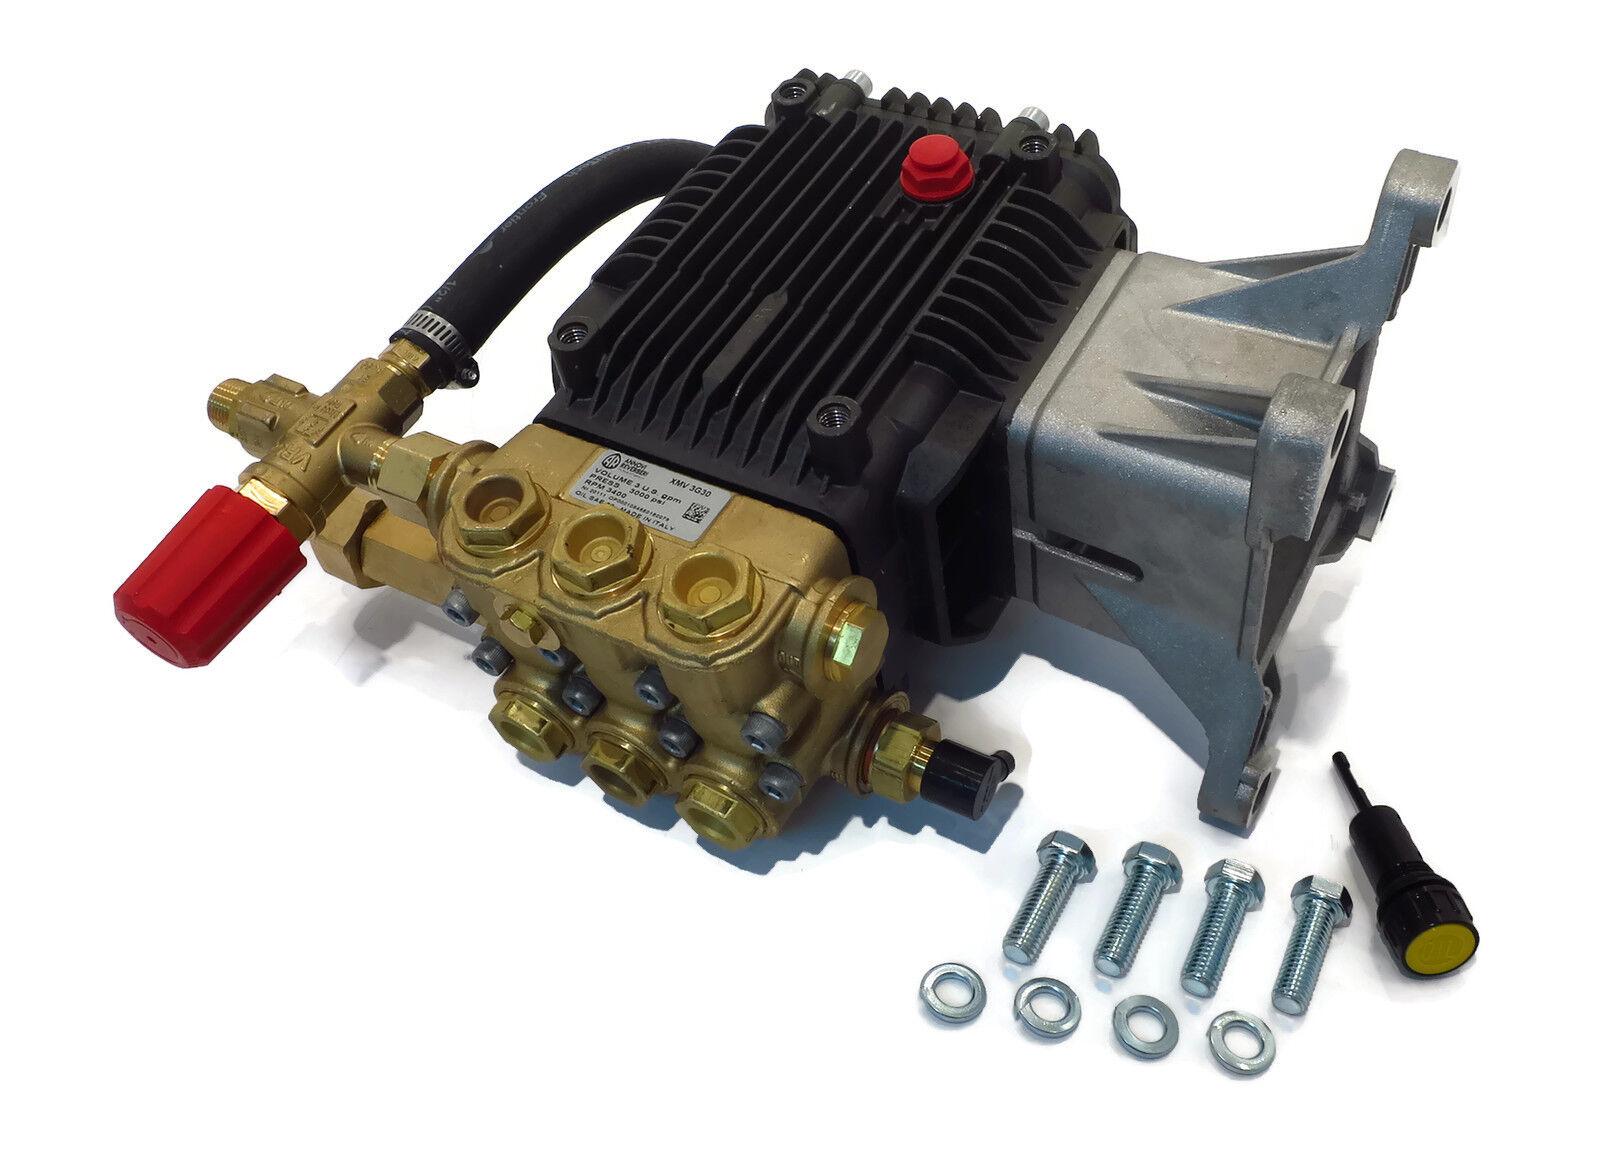 Arandela de presión de alimentación de 3000 PSI Bomba De Agua Stratton 01905 01905-0 1905 Briggs &